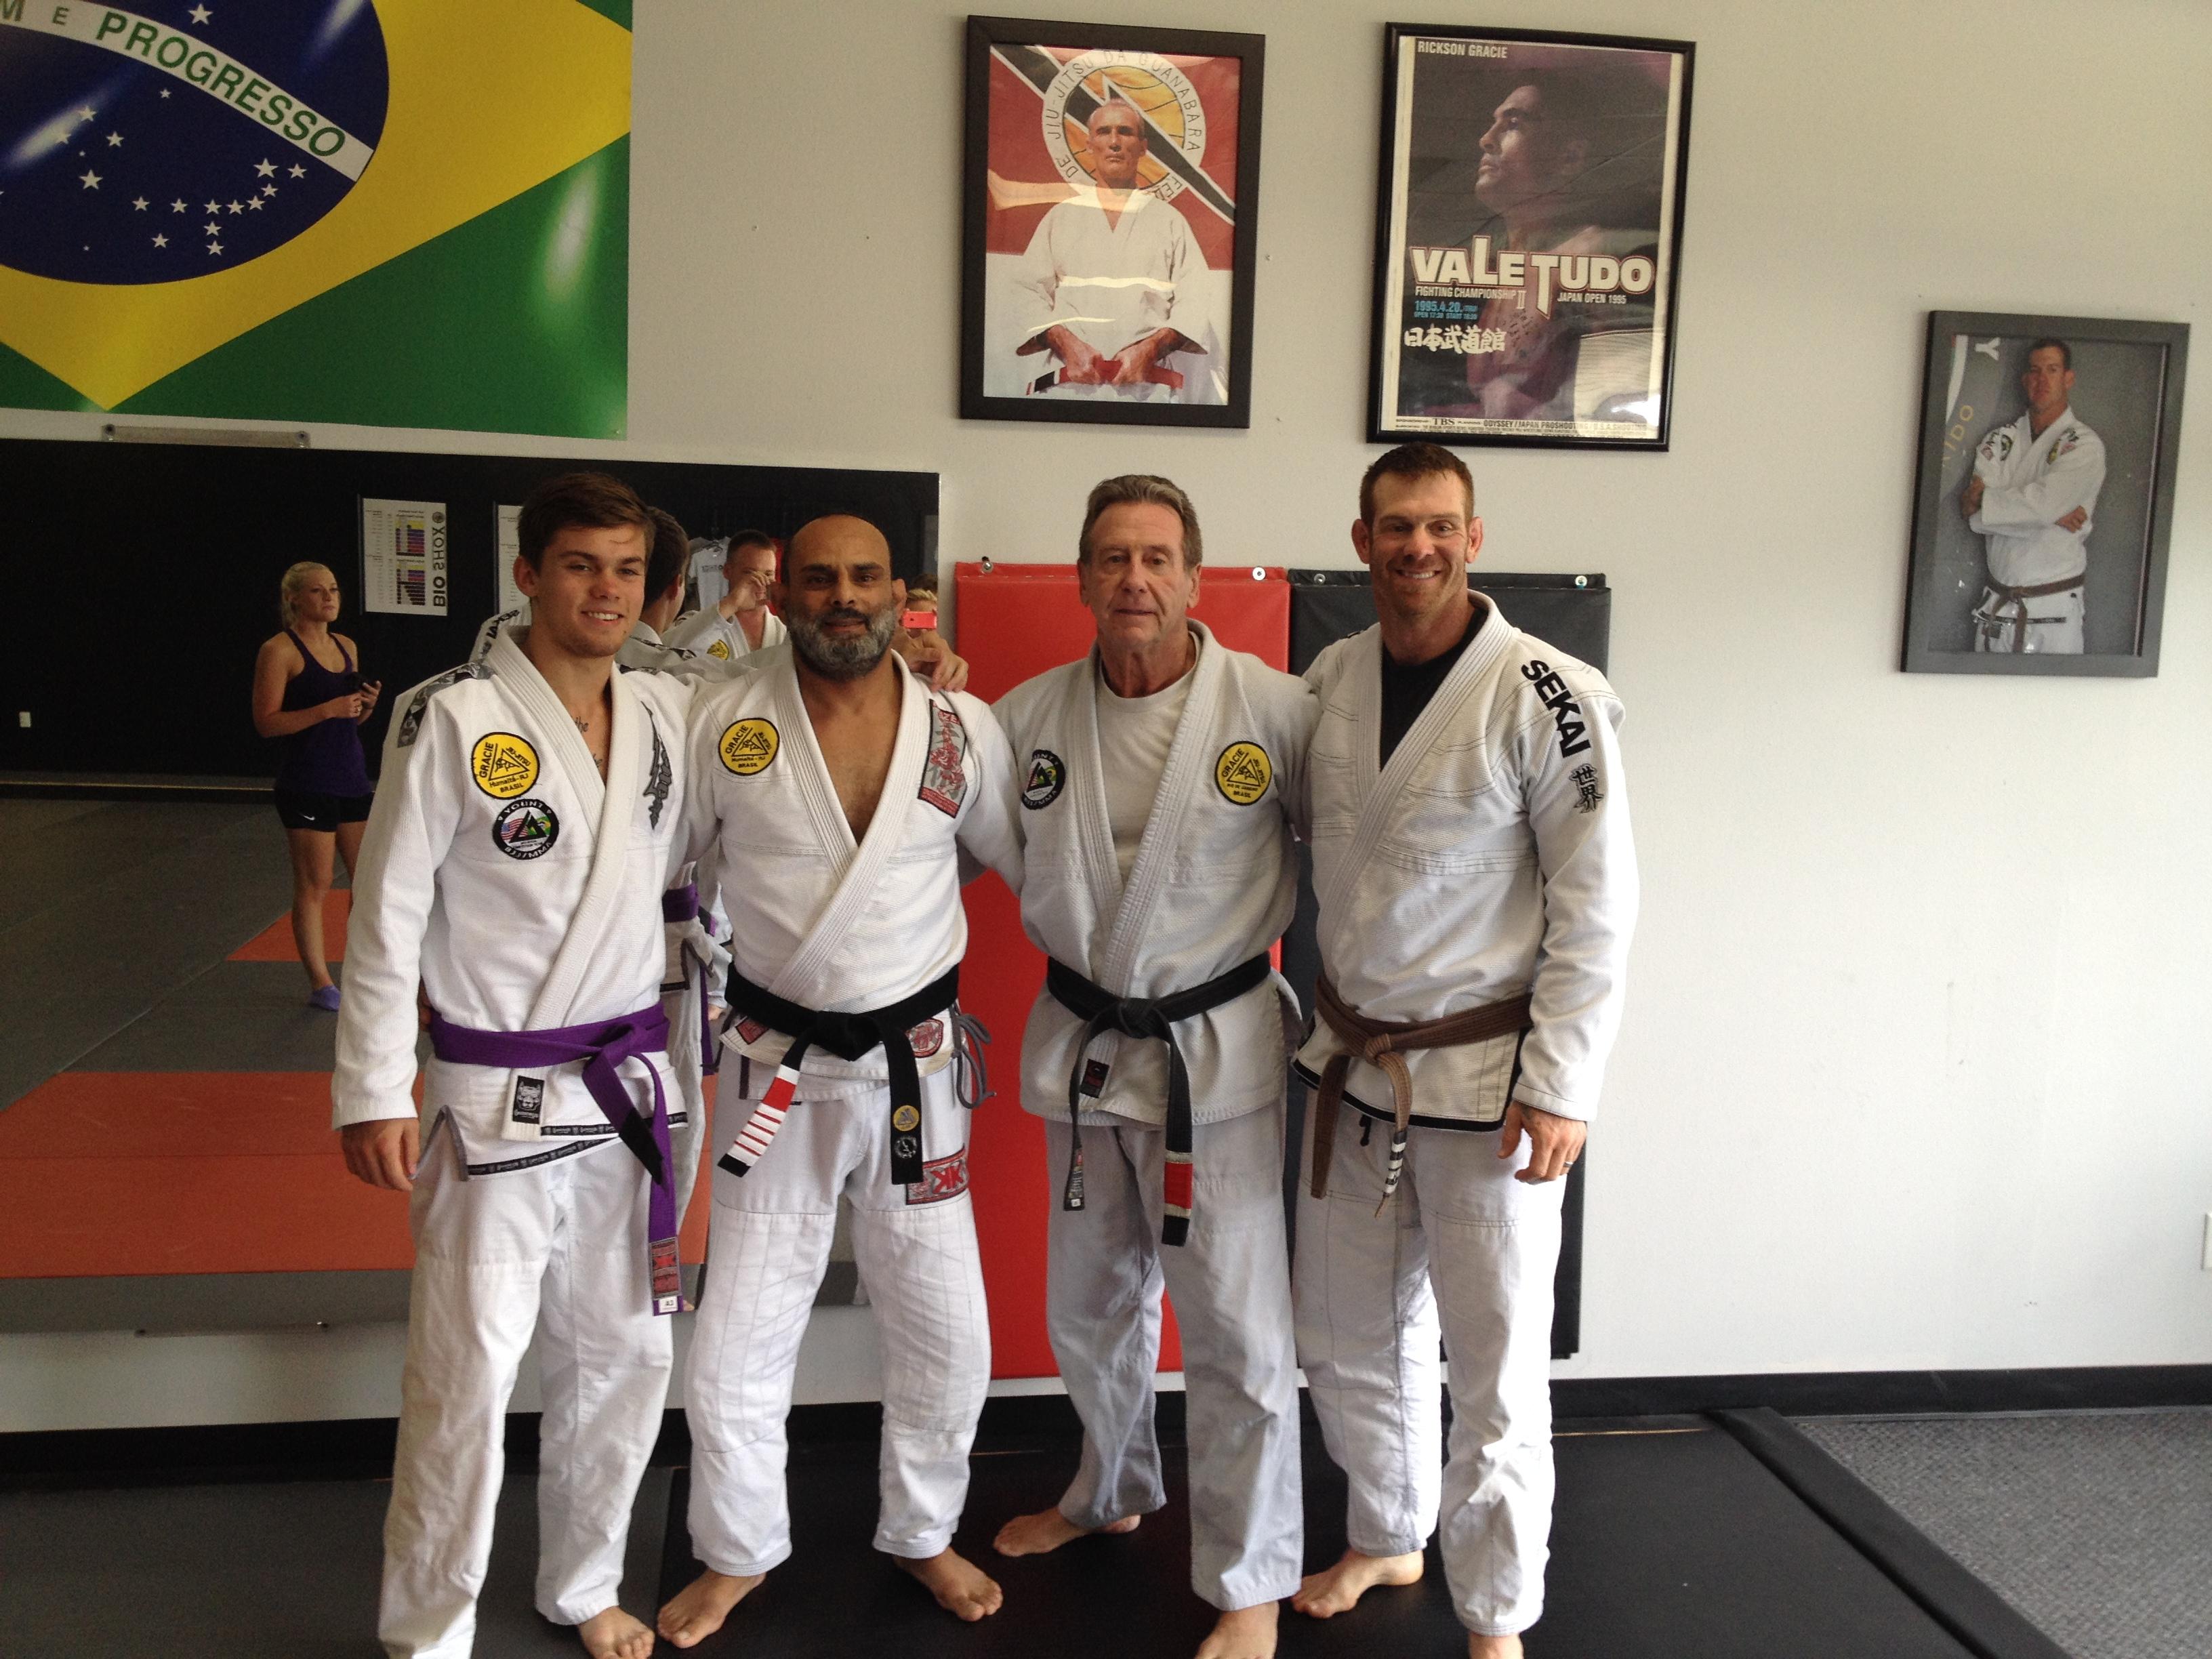 Matt, David, Steve and Andy